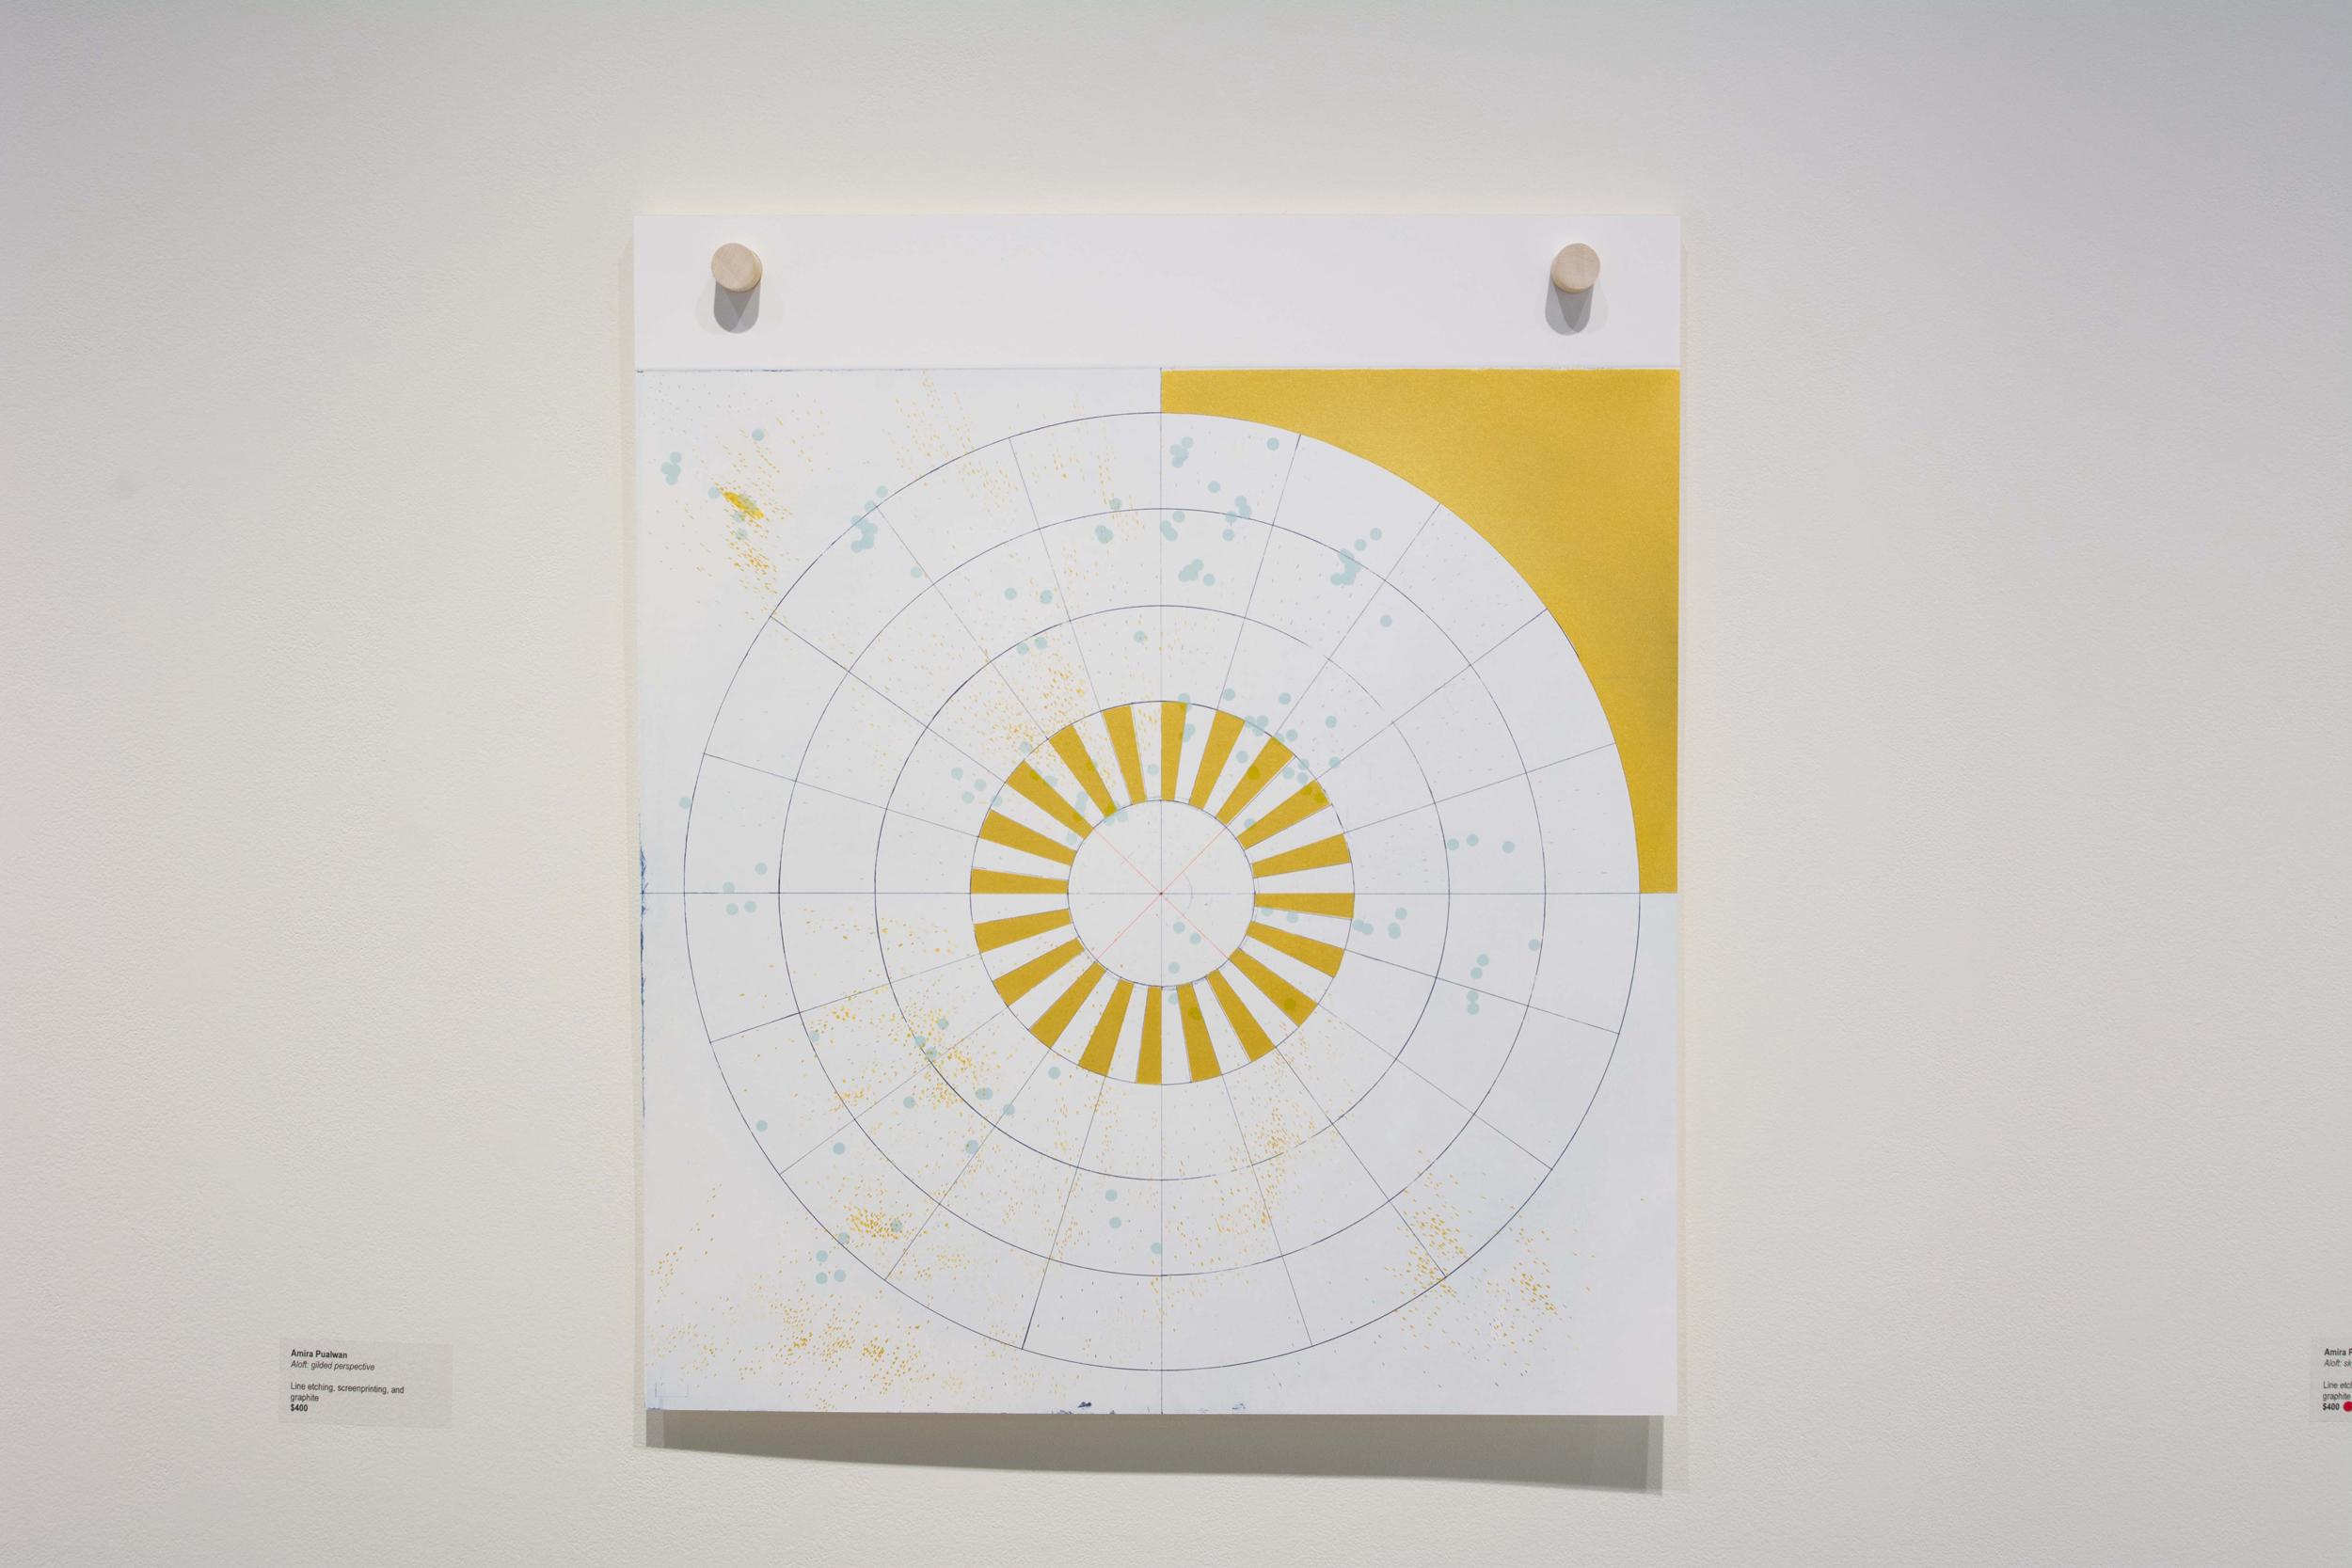 Highpoint PrintmakingJerome Emerging Printmakers Exhibit160620a056.JPG